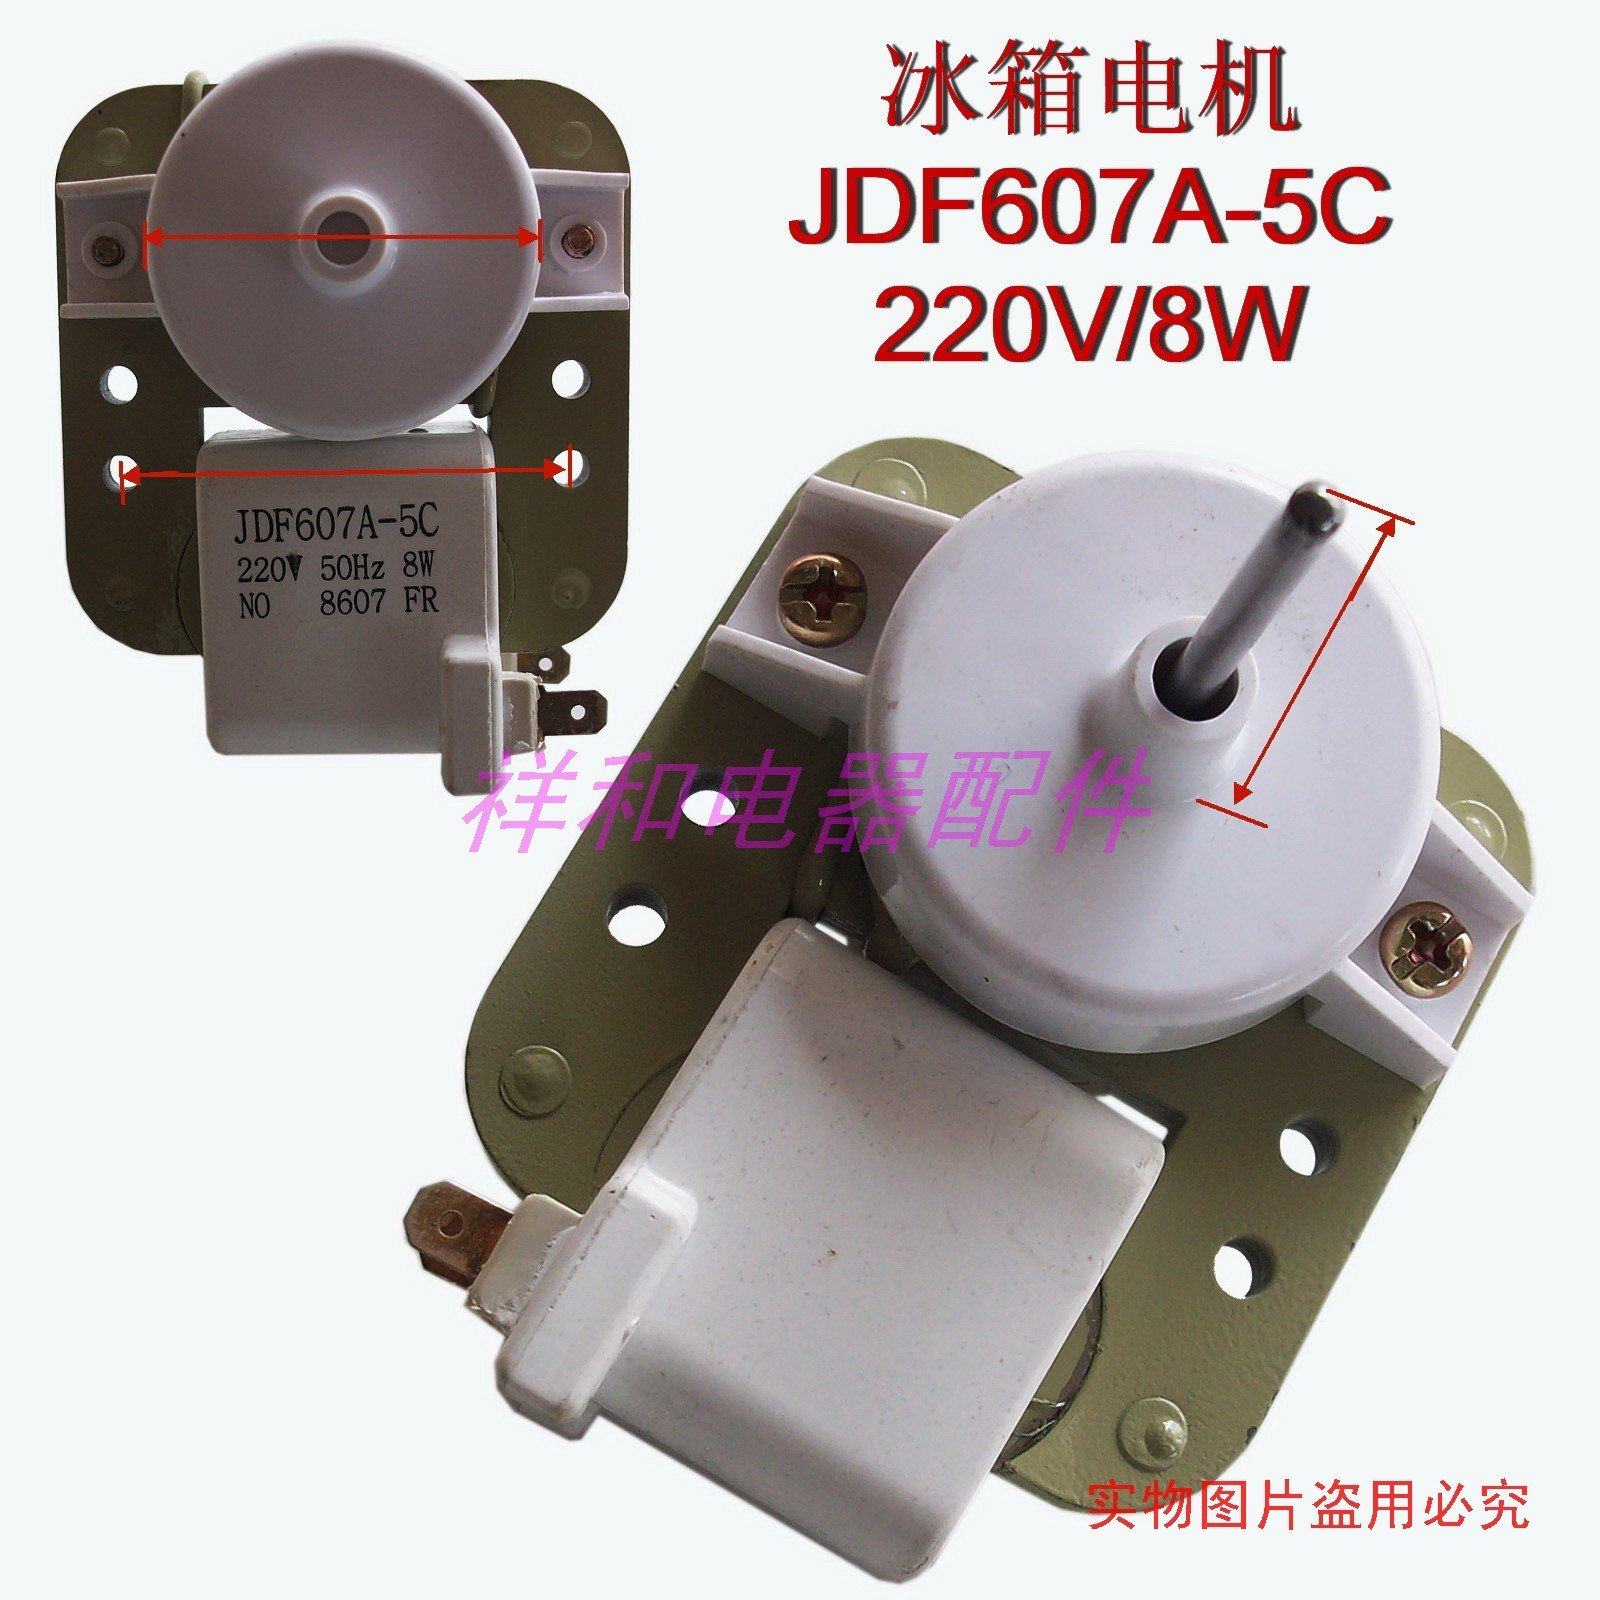 Refrigerator parts super thin refrigerator fan motor refrigerator cooling motor JDF607A-5C cooling fan motor refrigetor motor freezer parts motor is3215eab